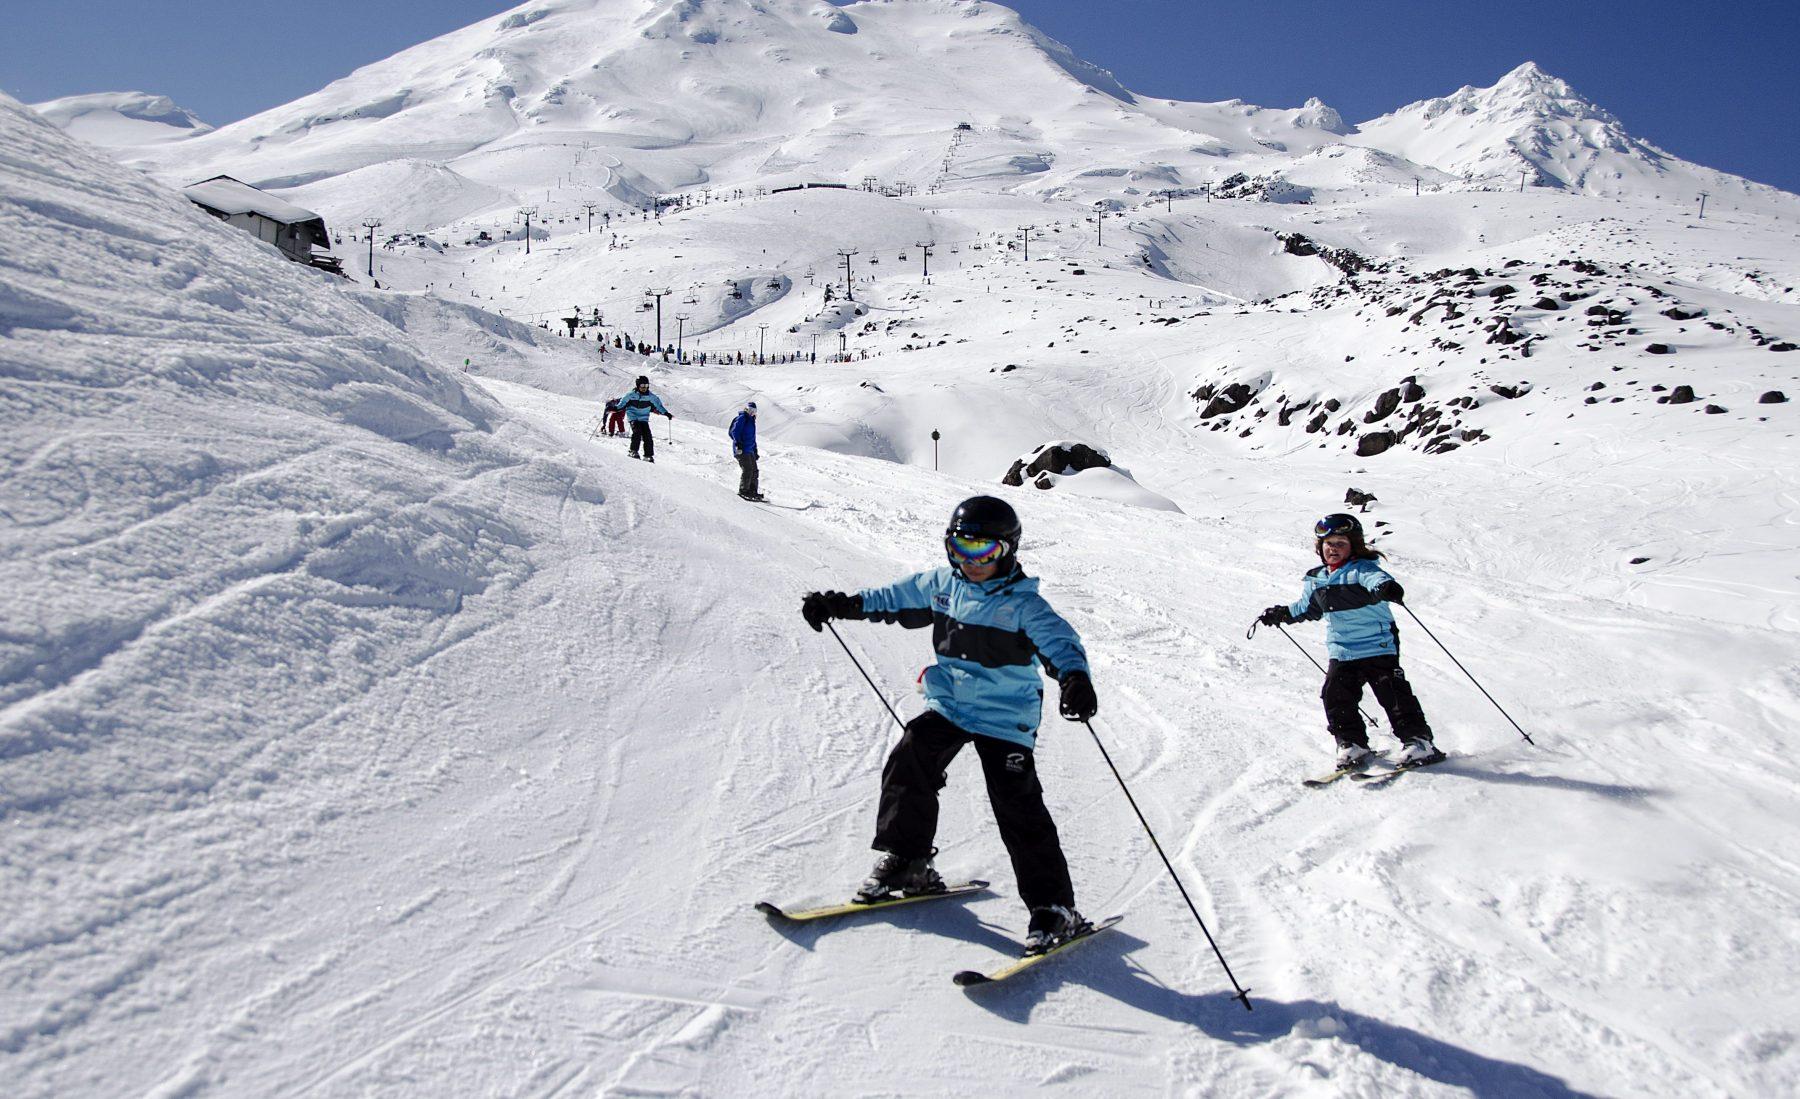 MOUNT RUAPEHU, NEW ZEALAND - JULY 12 2015 Turoa ski field on Mount Ruapehu in New Zealand's North Island. Turoa is the most popular ski filed in the North Island.